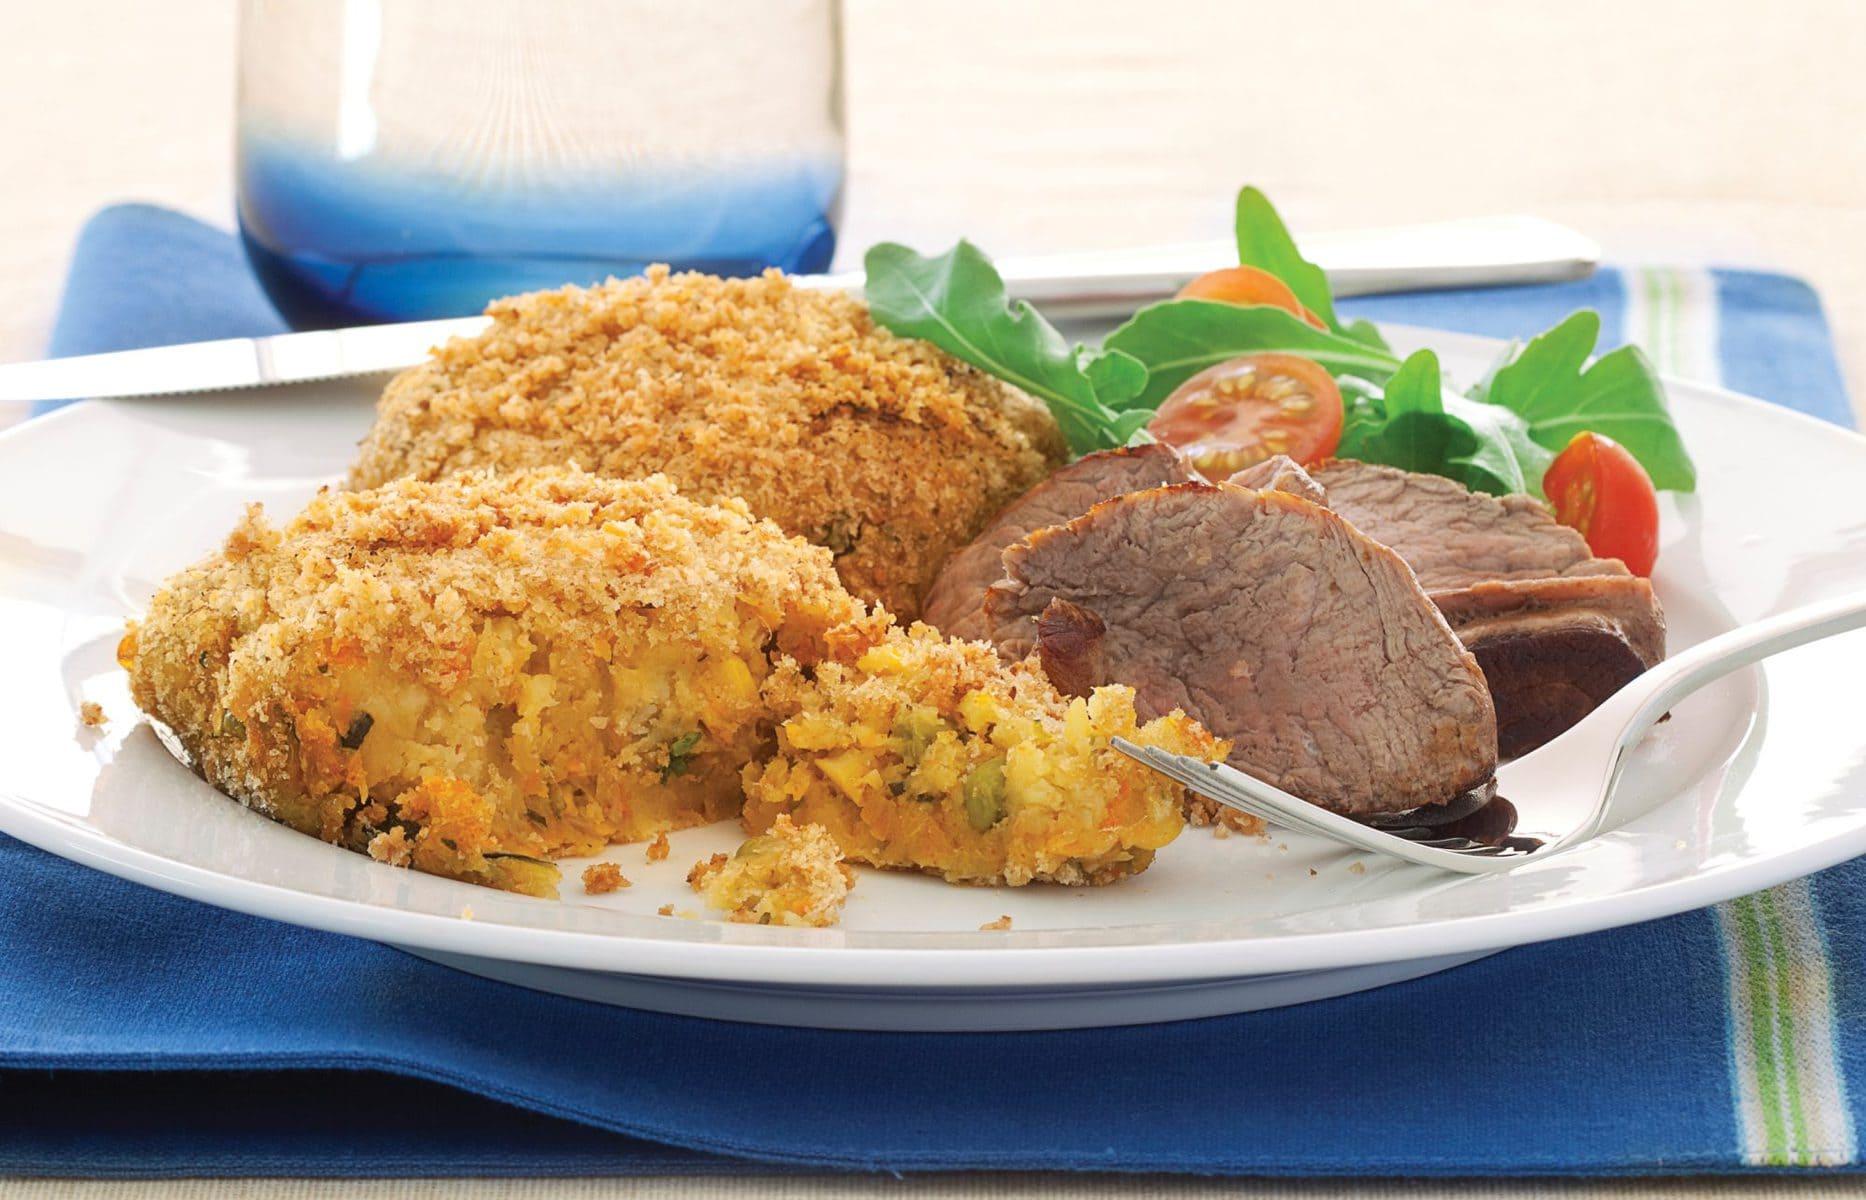 Crispy vegetable cakes with steak